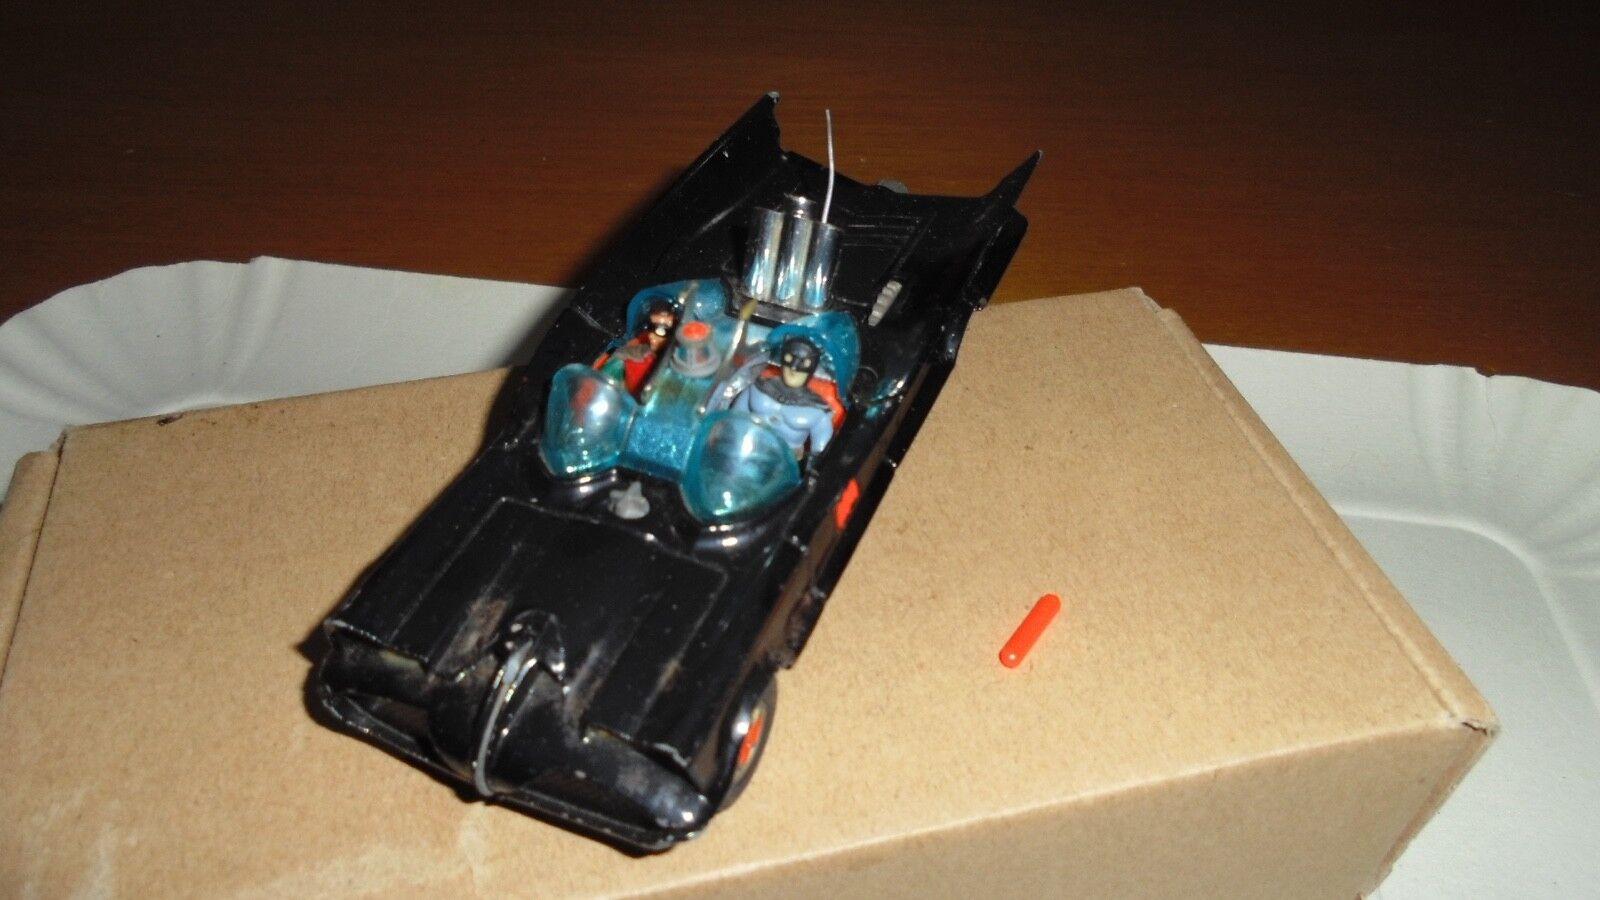 CORGI giocattoli vintage  BATuomo BATMOBILE   AUTO VINTAGE OLG giocattoli